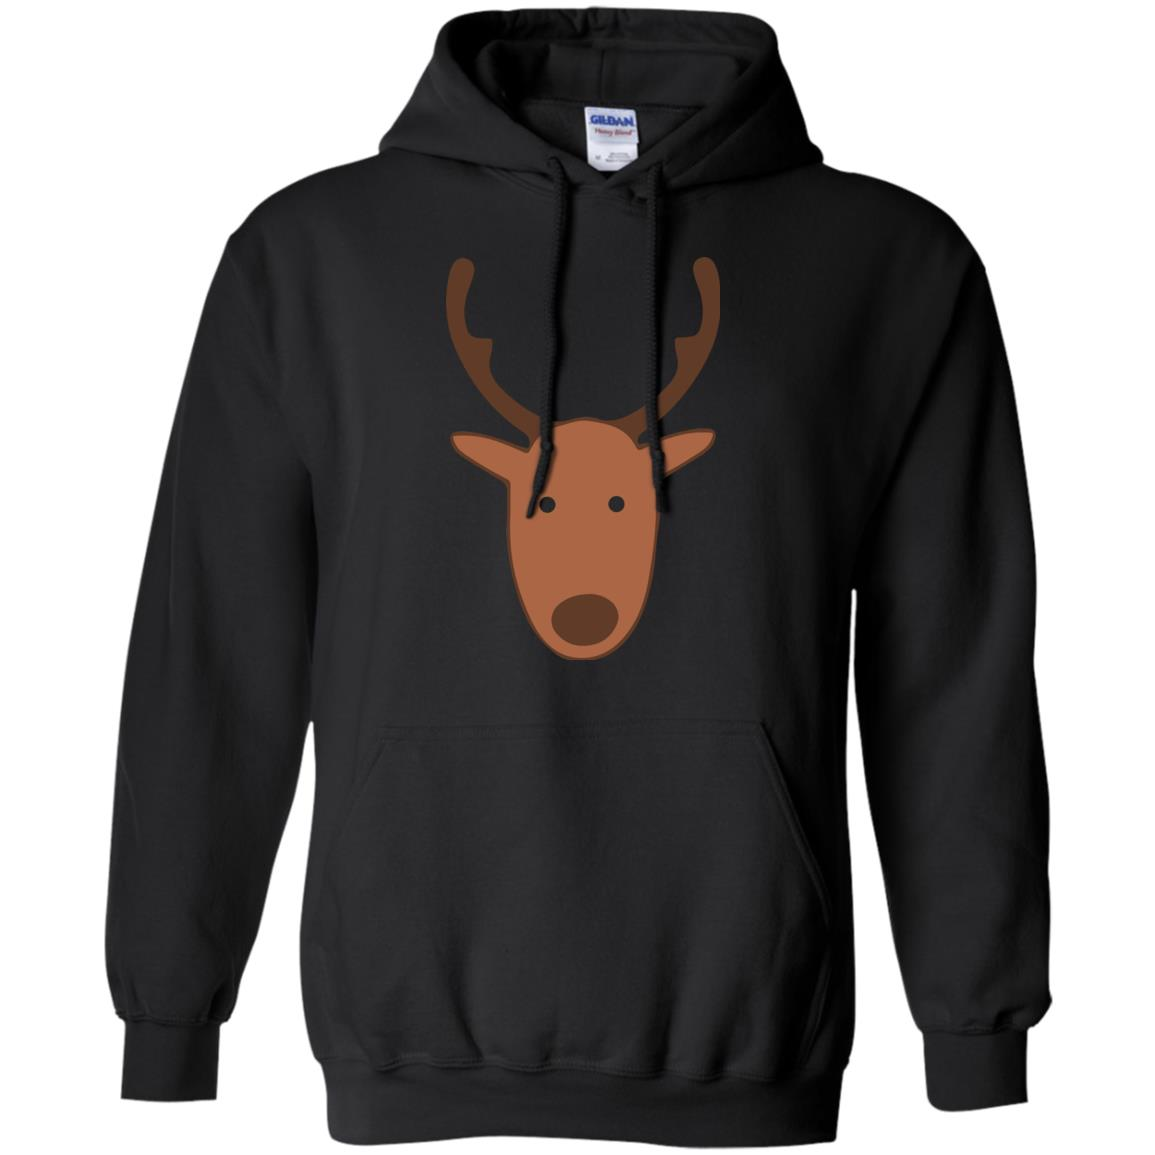 image 4770 - Tina Belcher Reindeer Christmas Sweater, Shirt, Hoodie